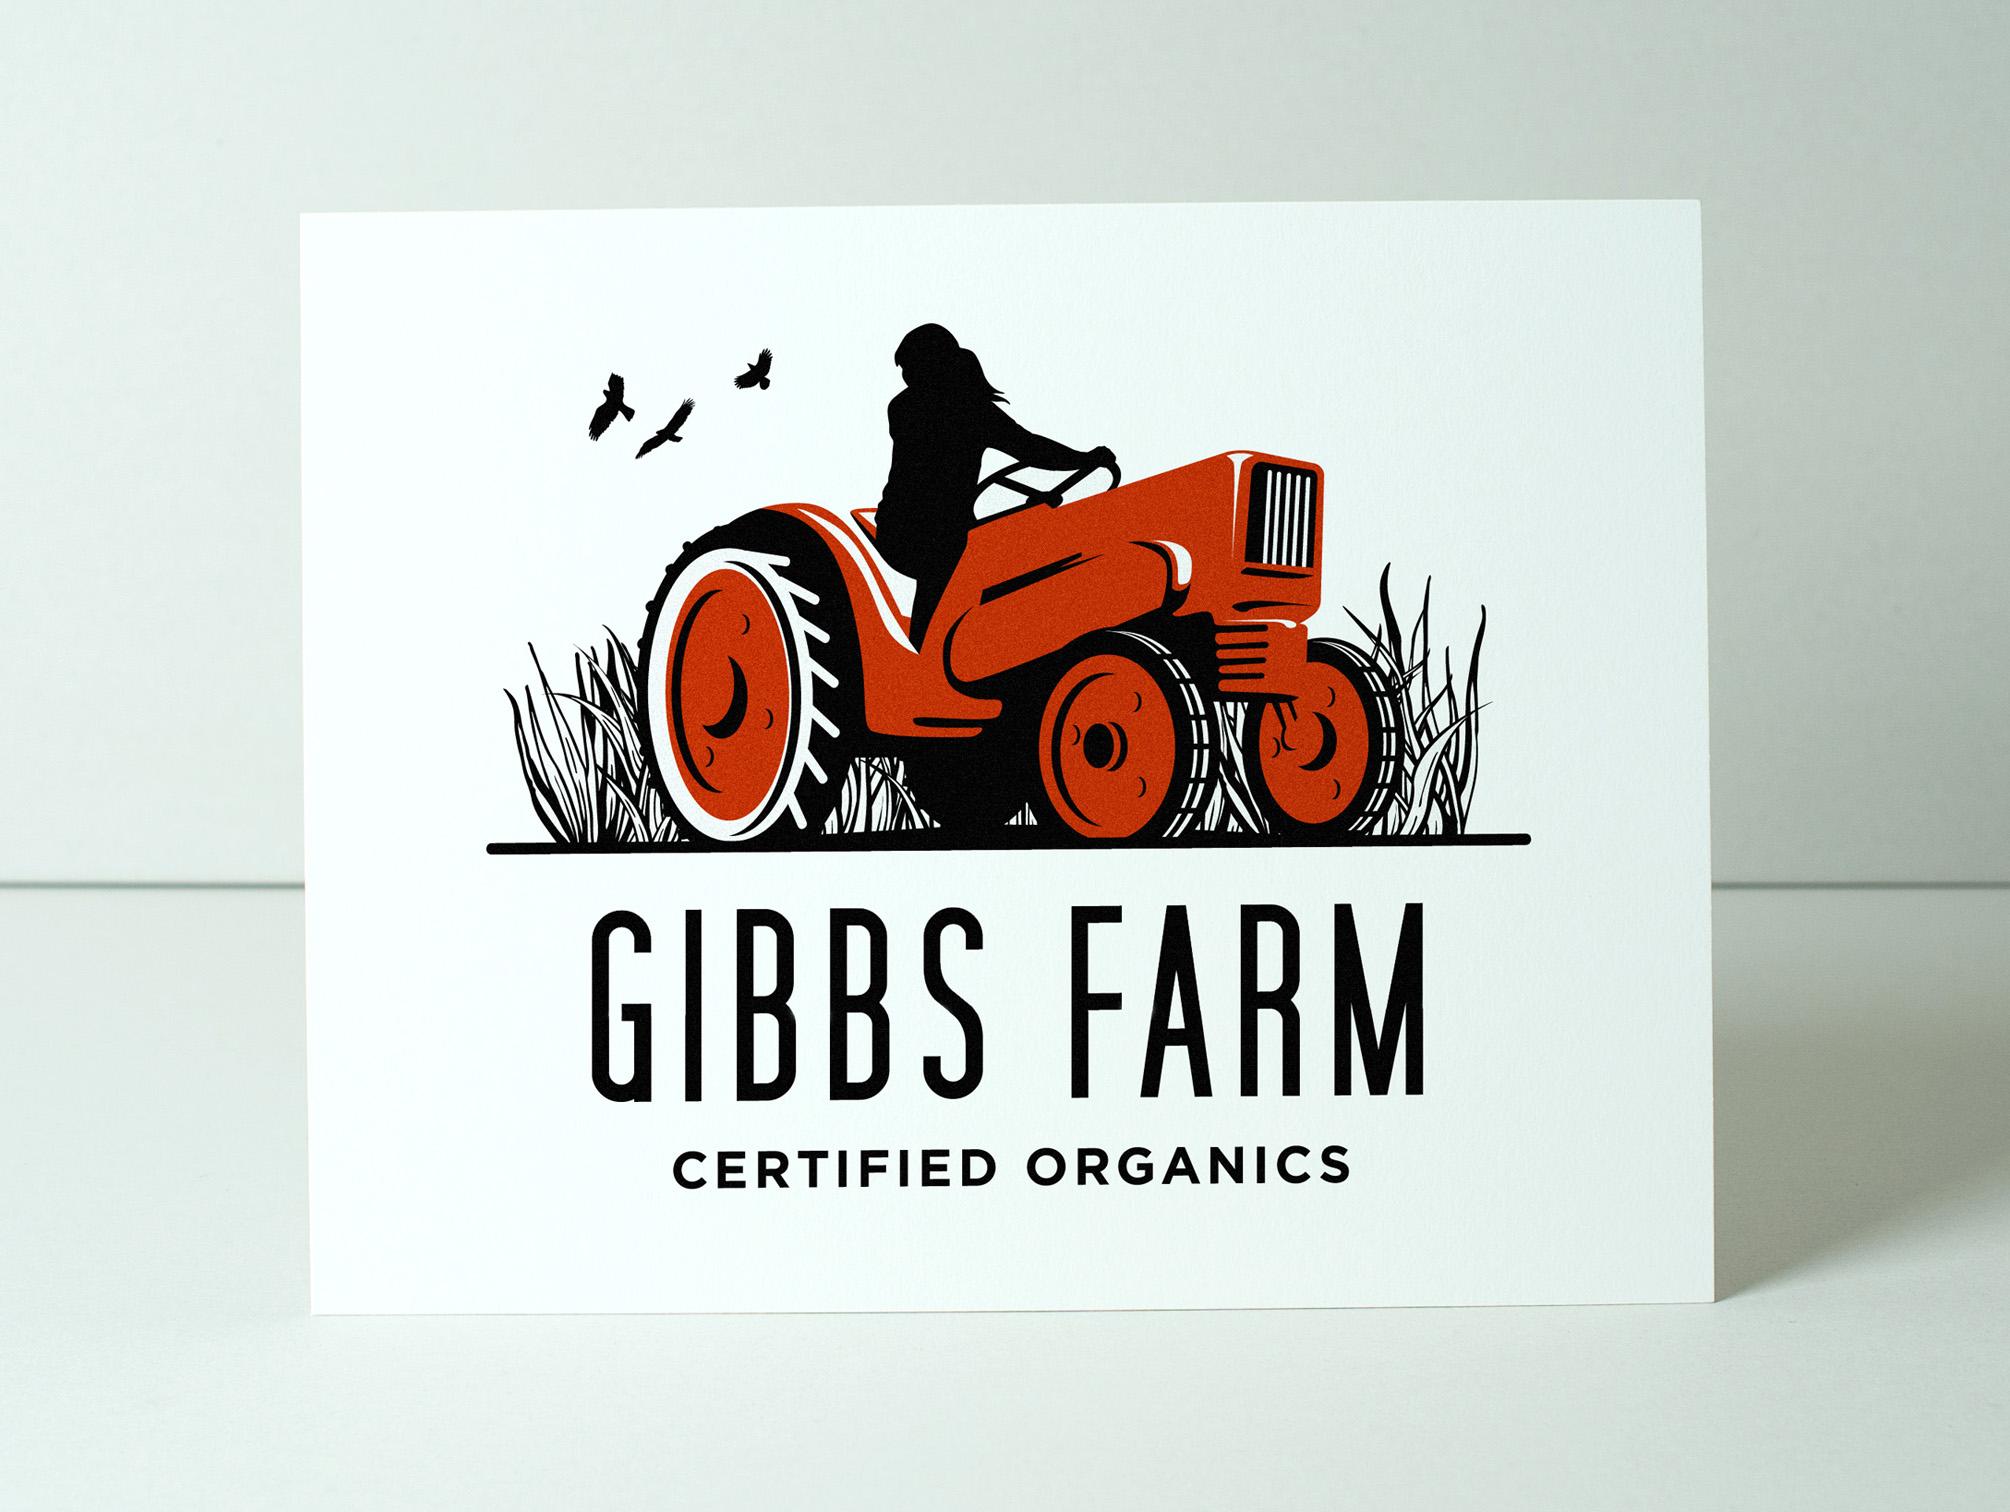 GibbsFarm1.jpg